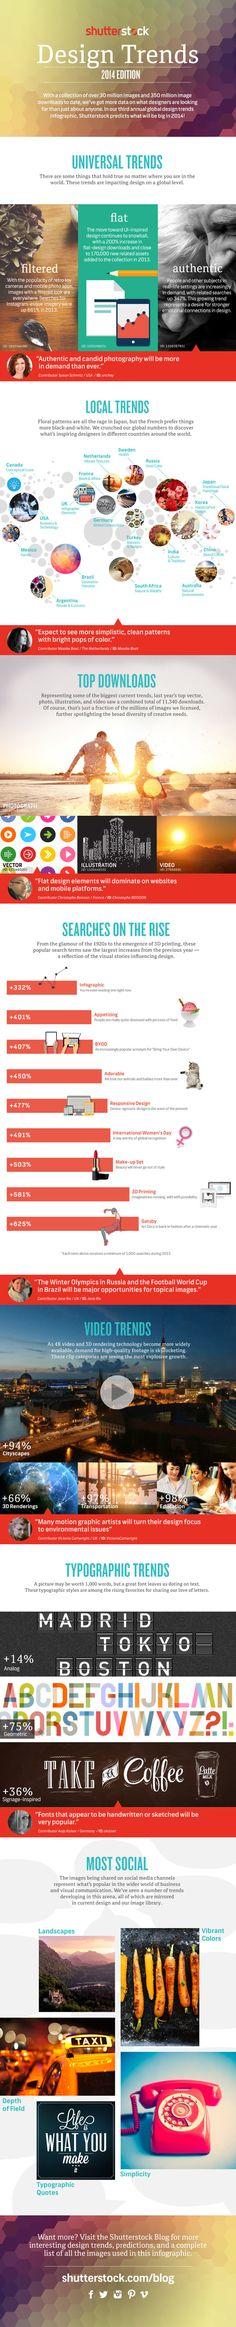 Design Trends #2014 #Infographic #design #trends